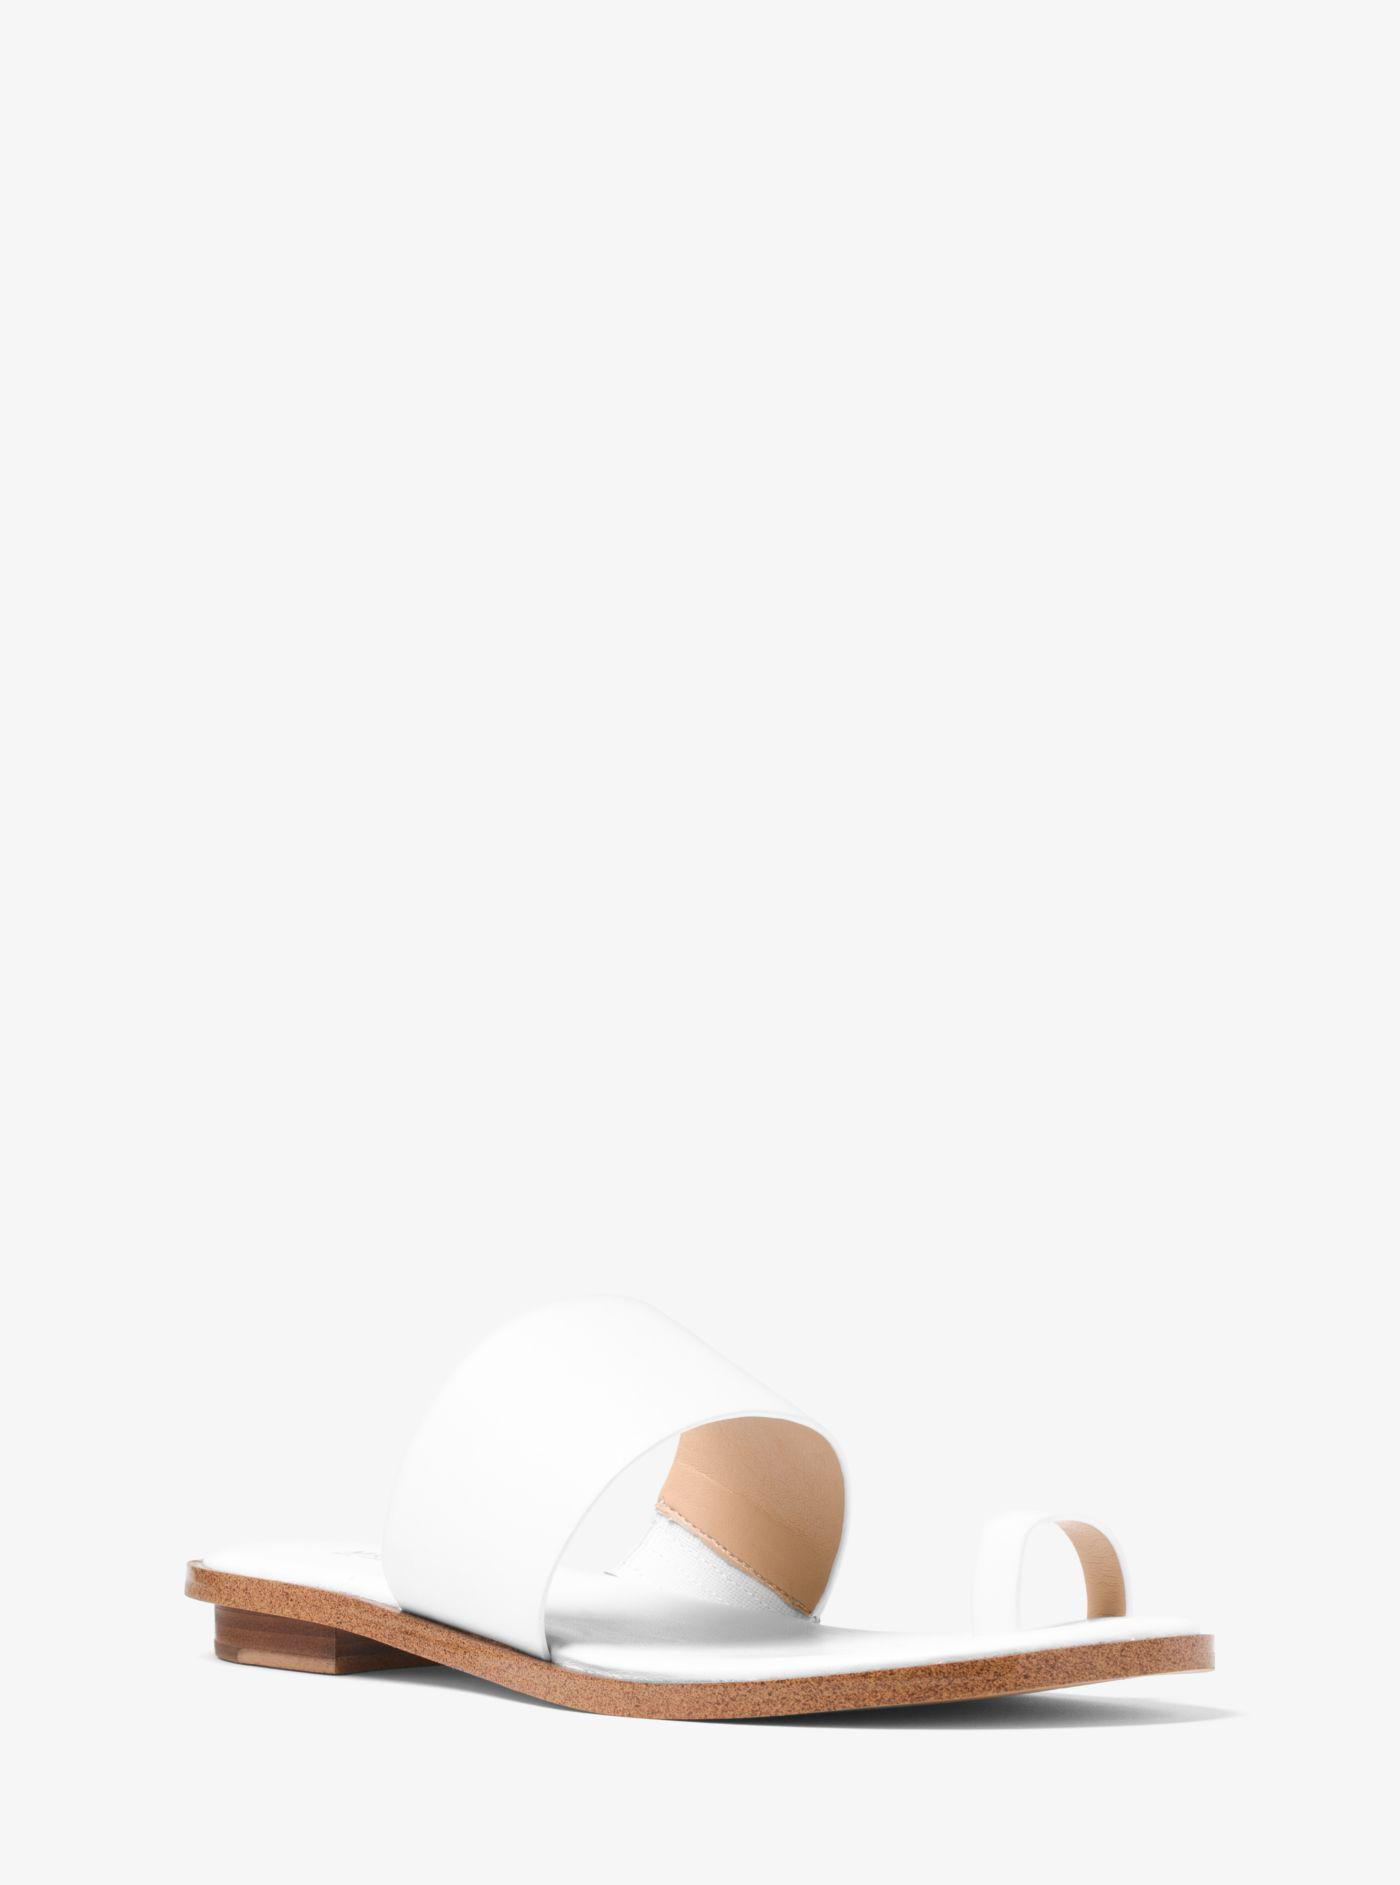 42031f908db Michael Kors Sonya Leather Sandal in White - Lyst